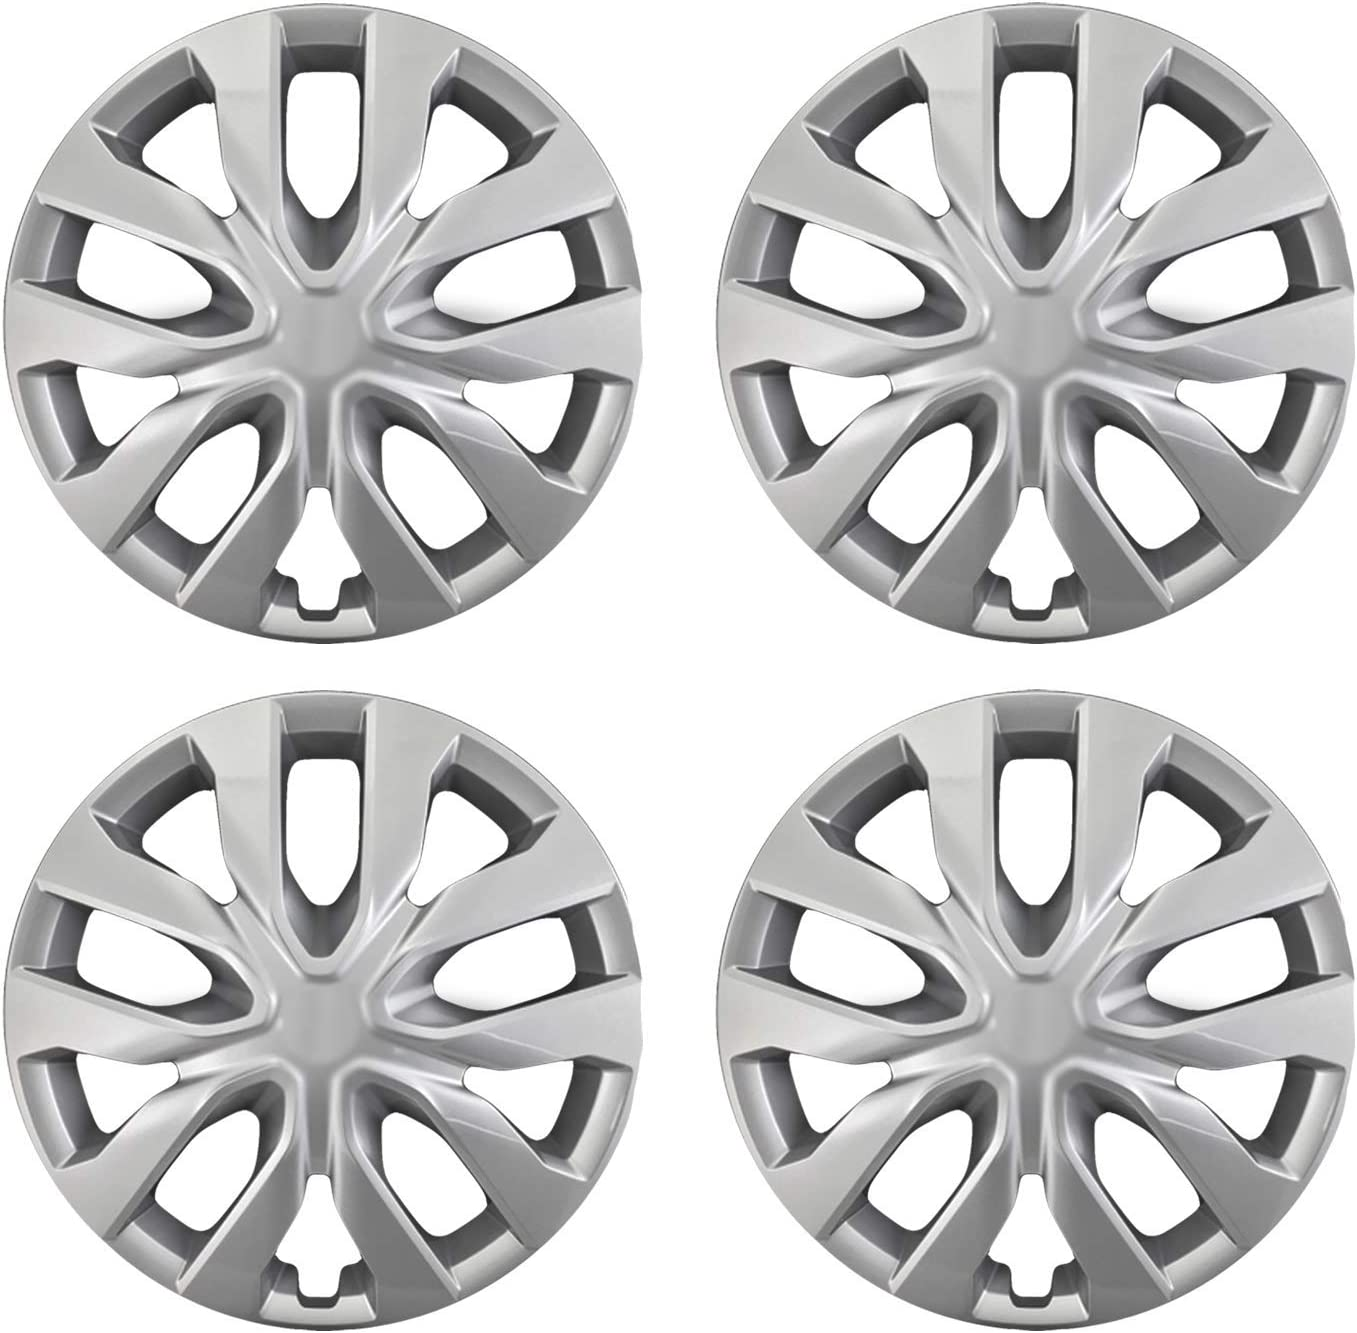 Amazon Com Mayde Hubcaps 16 Inch Titan Gray Metallic Wheel Covers Fits 16 Inch Wheels Set Of 4 Automotive